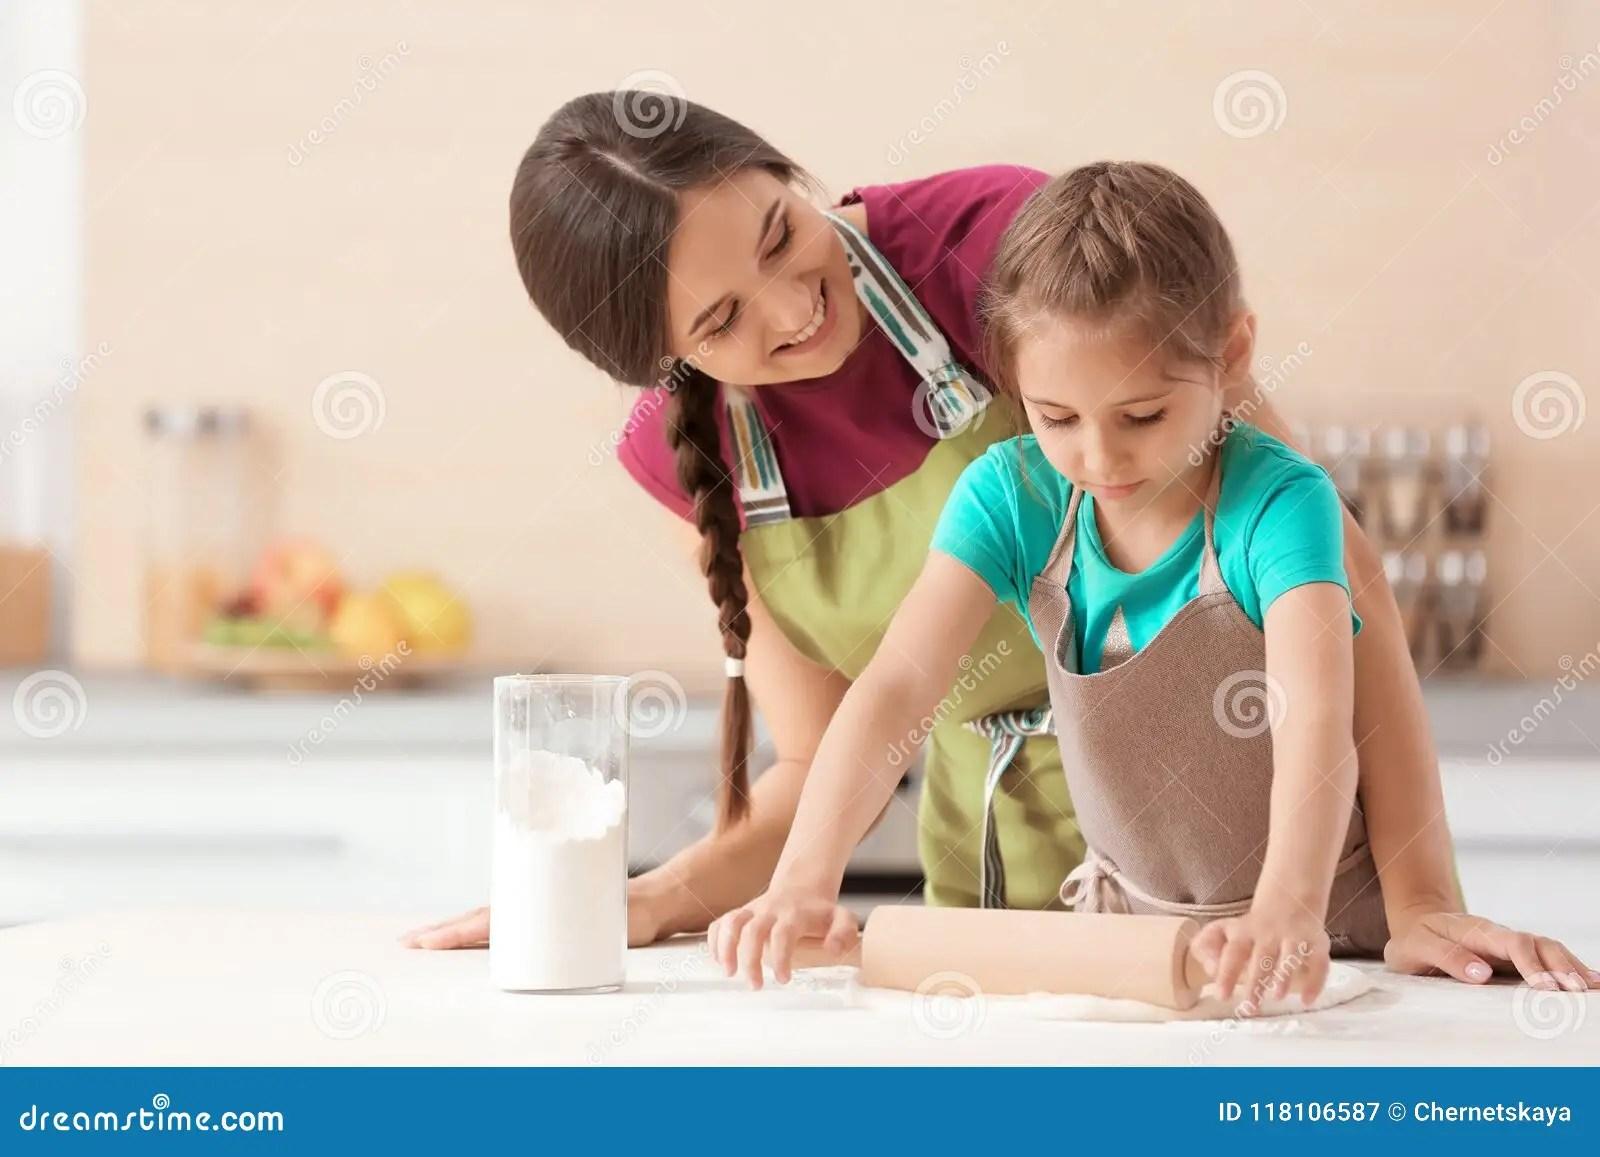 kitchen prep table oxo tools 在厨房里照顾和她的准备面团的女儿在桌上库存图片 图片包括有女性 烘烤 在厨房里照顾和她准备面团的逗人喜爱的女儿在桌上